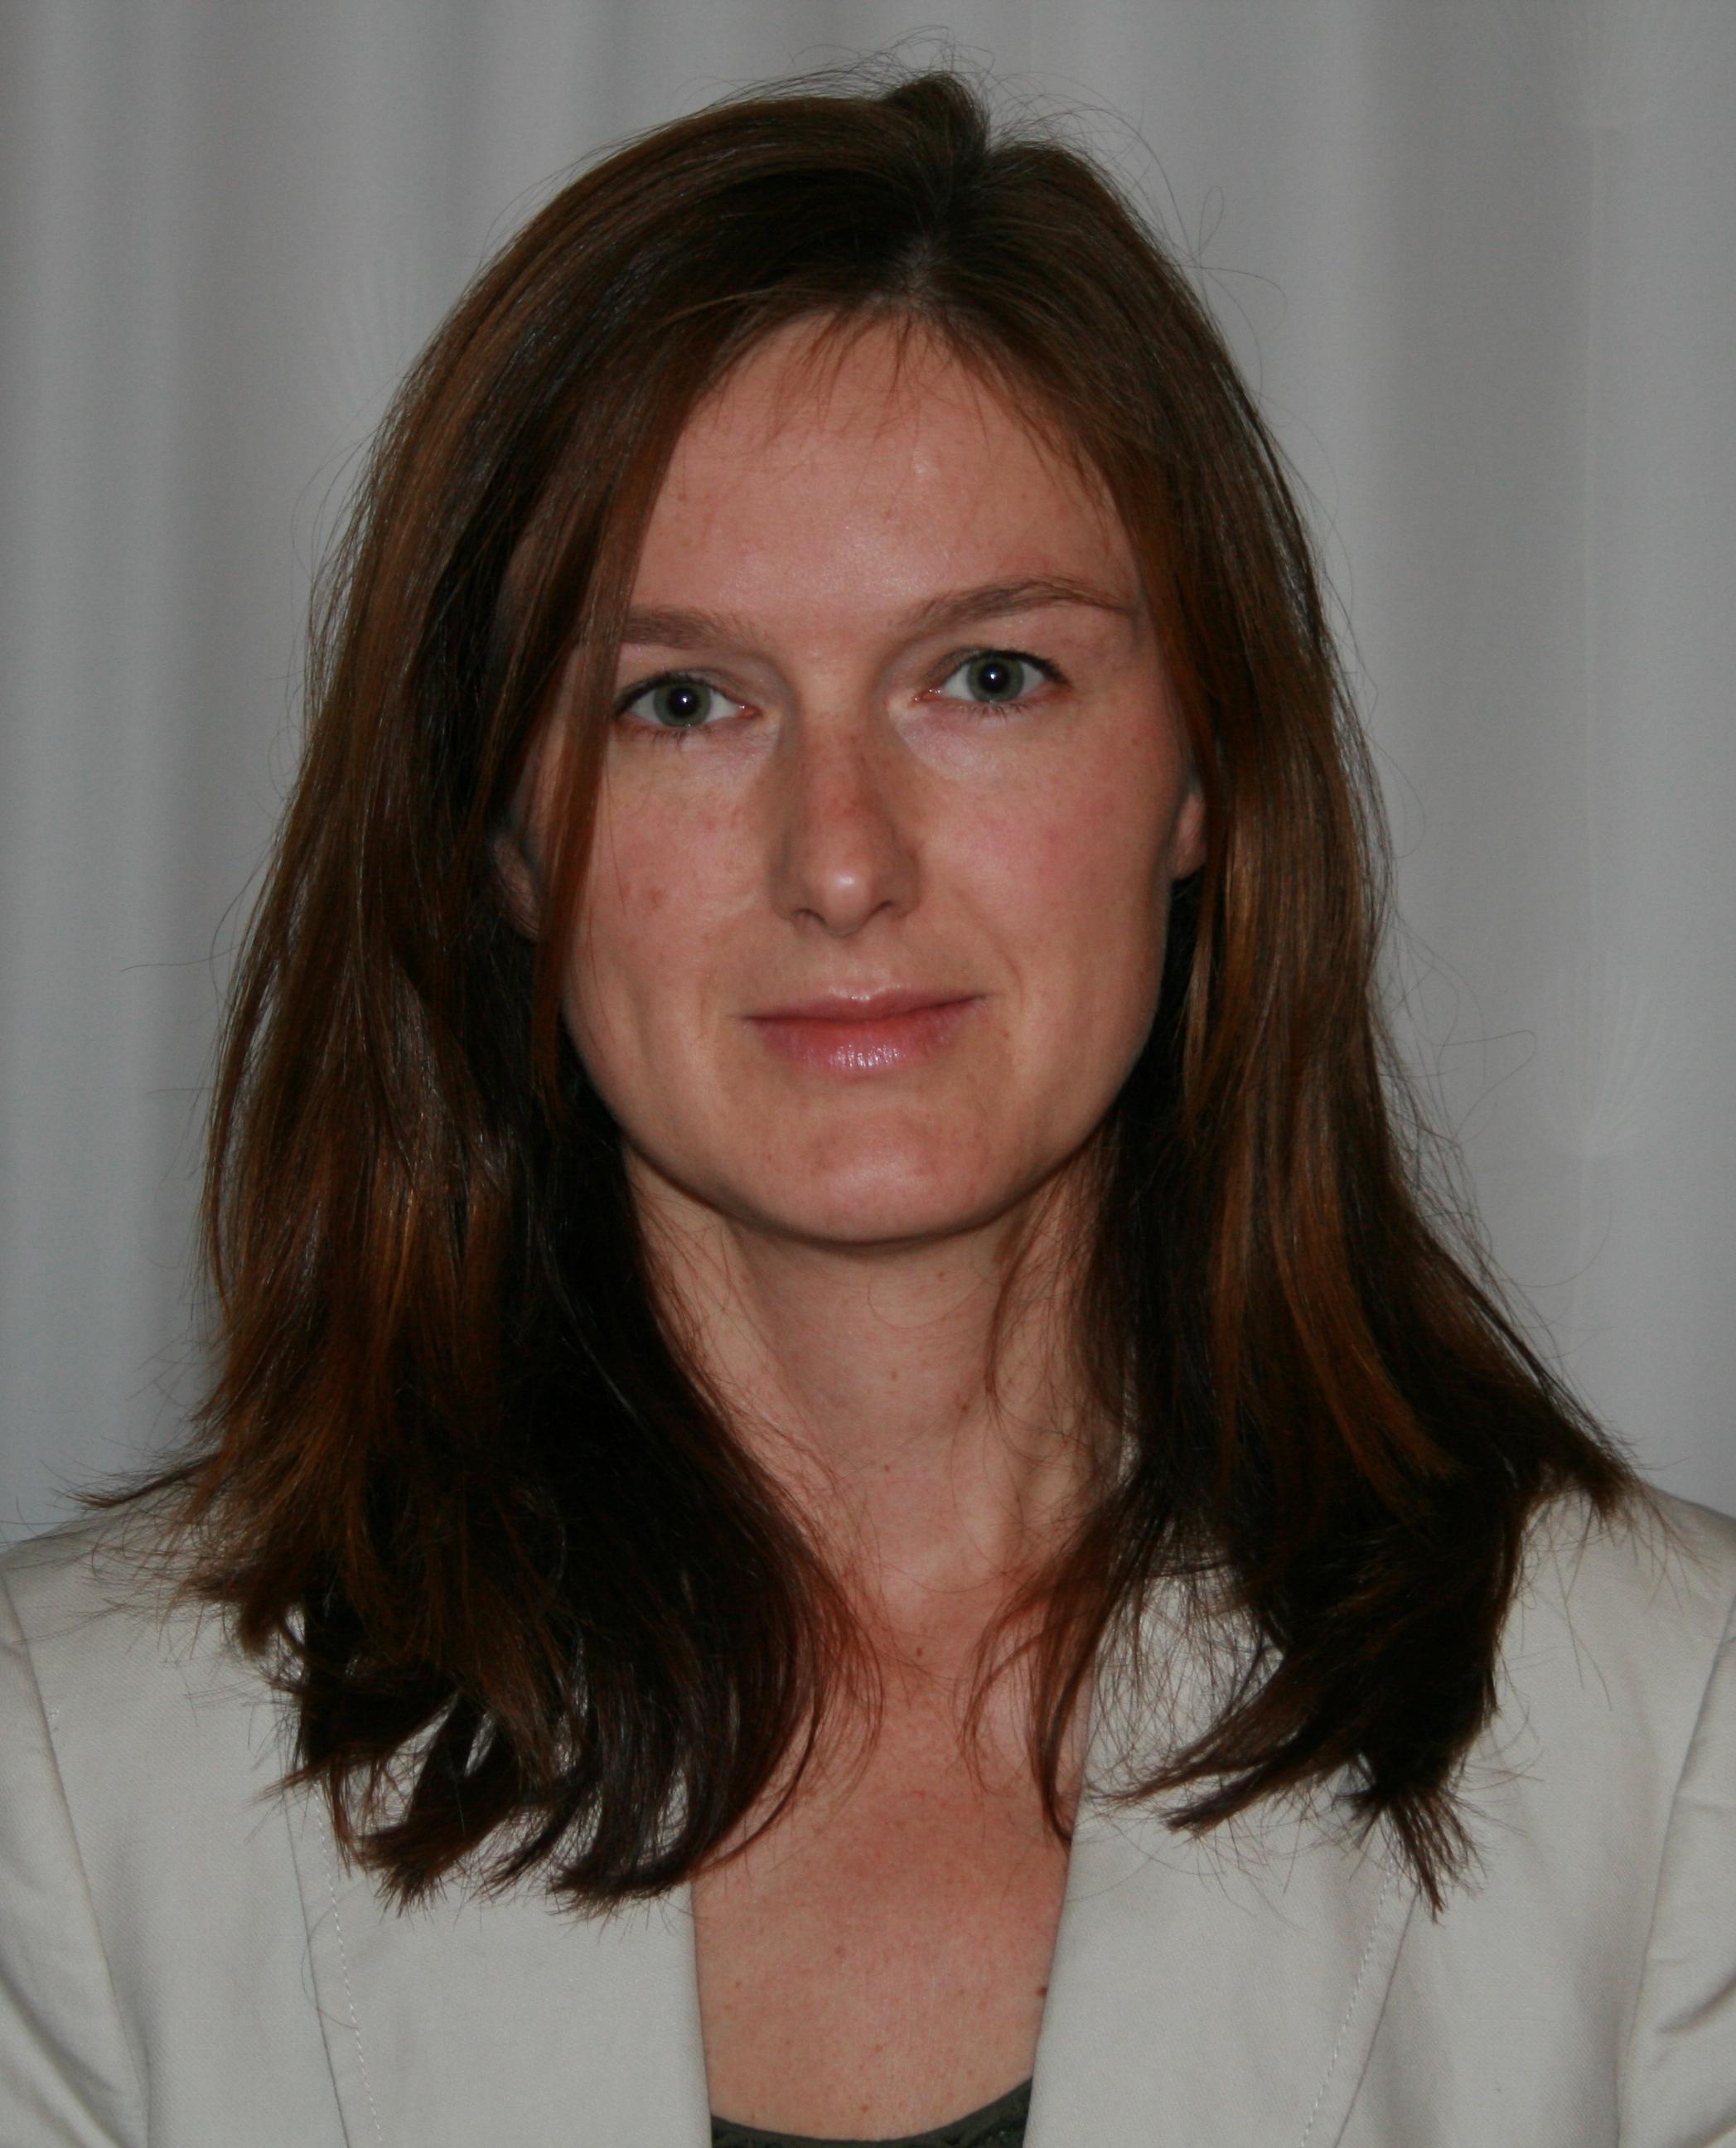 Portrait of Astrid Seidl